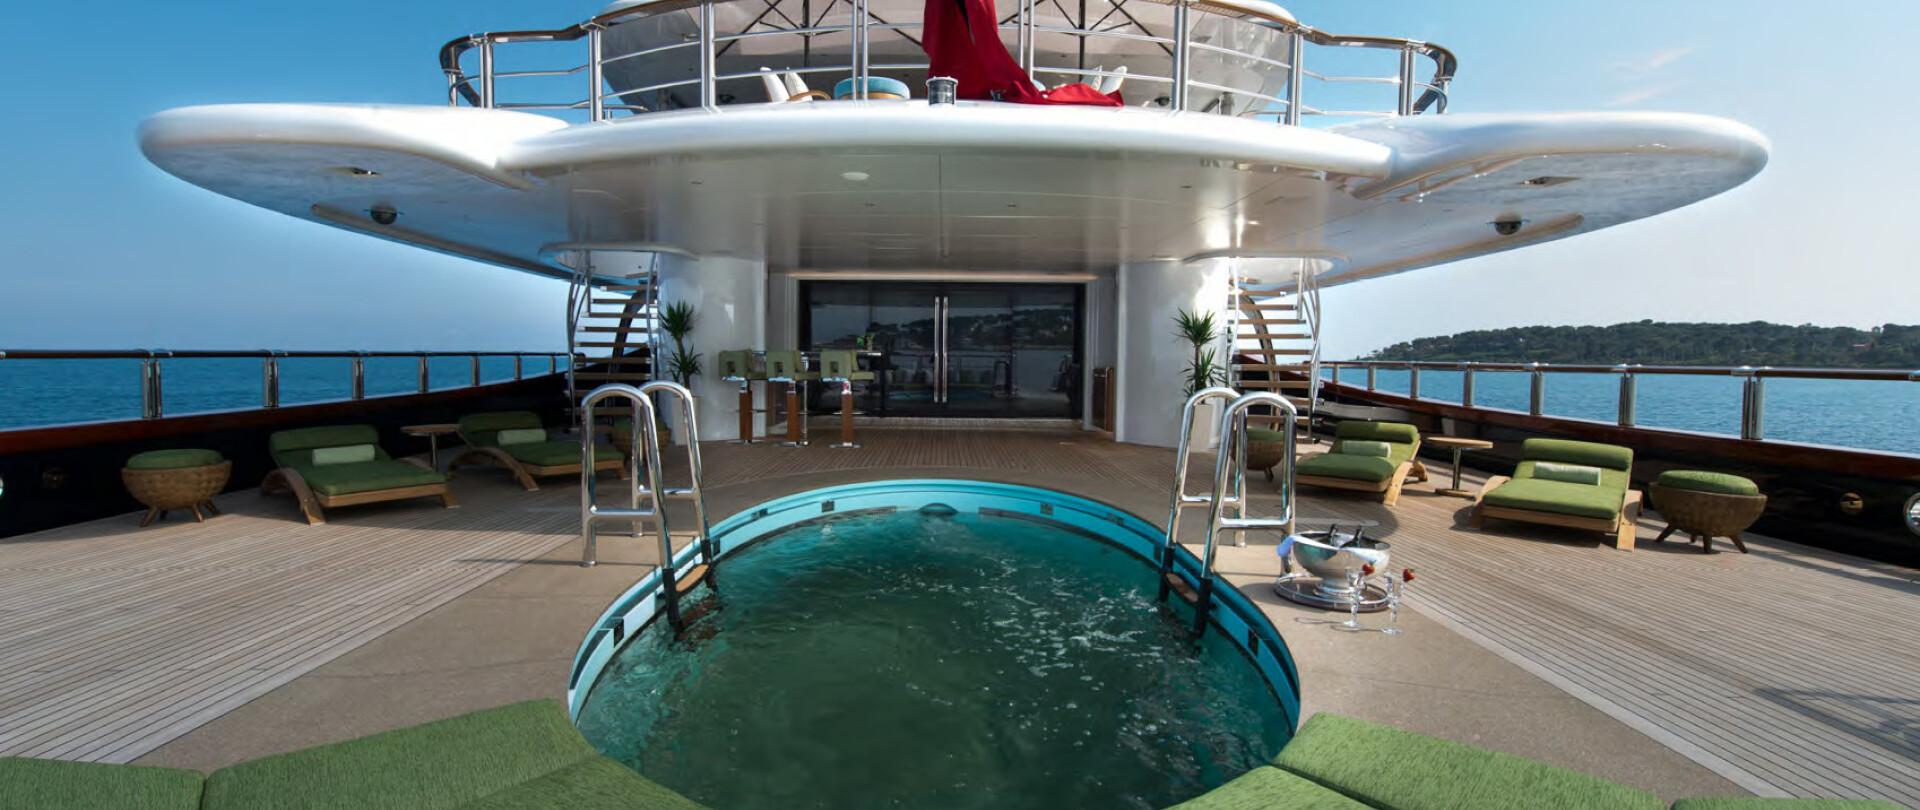 NIRVANA Yacht for Sale photo 3